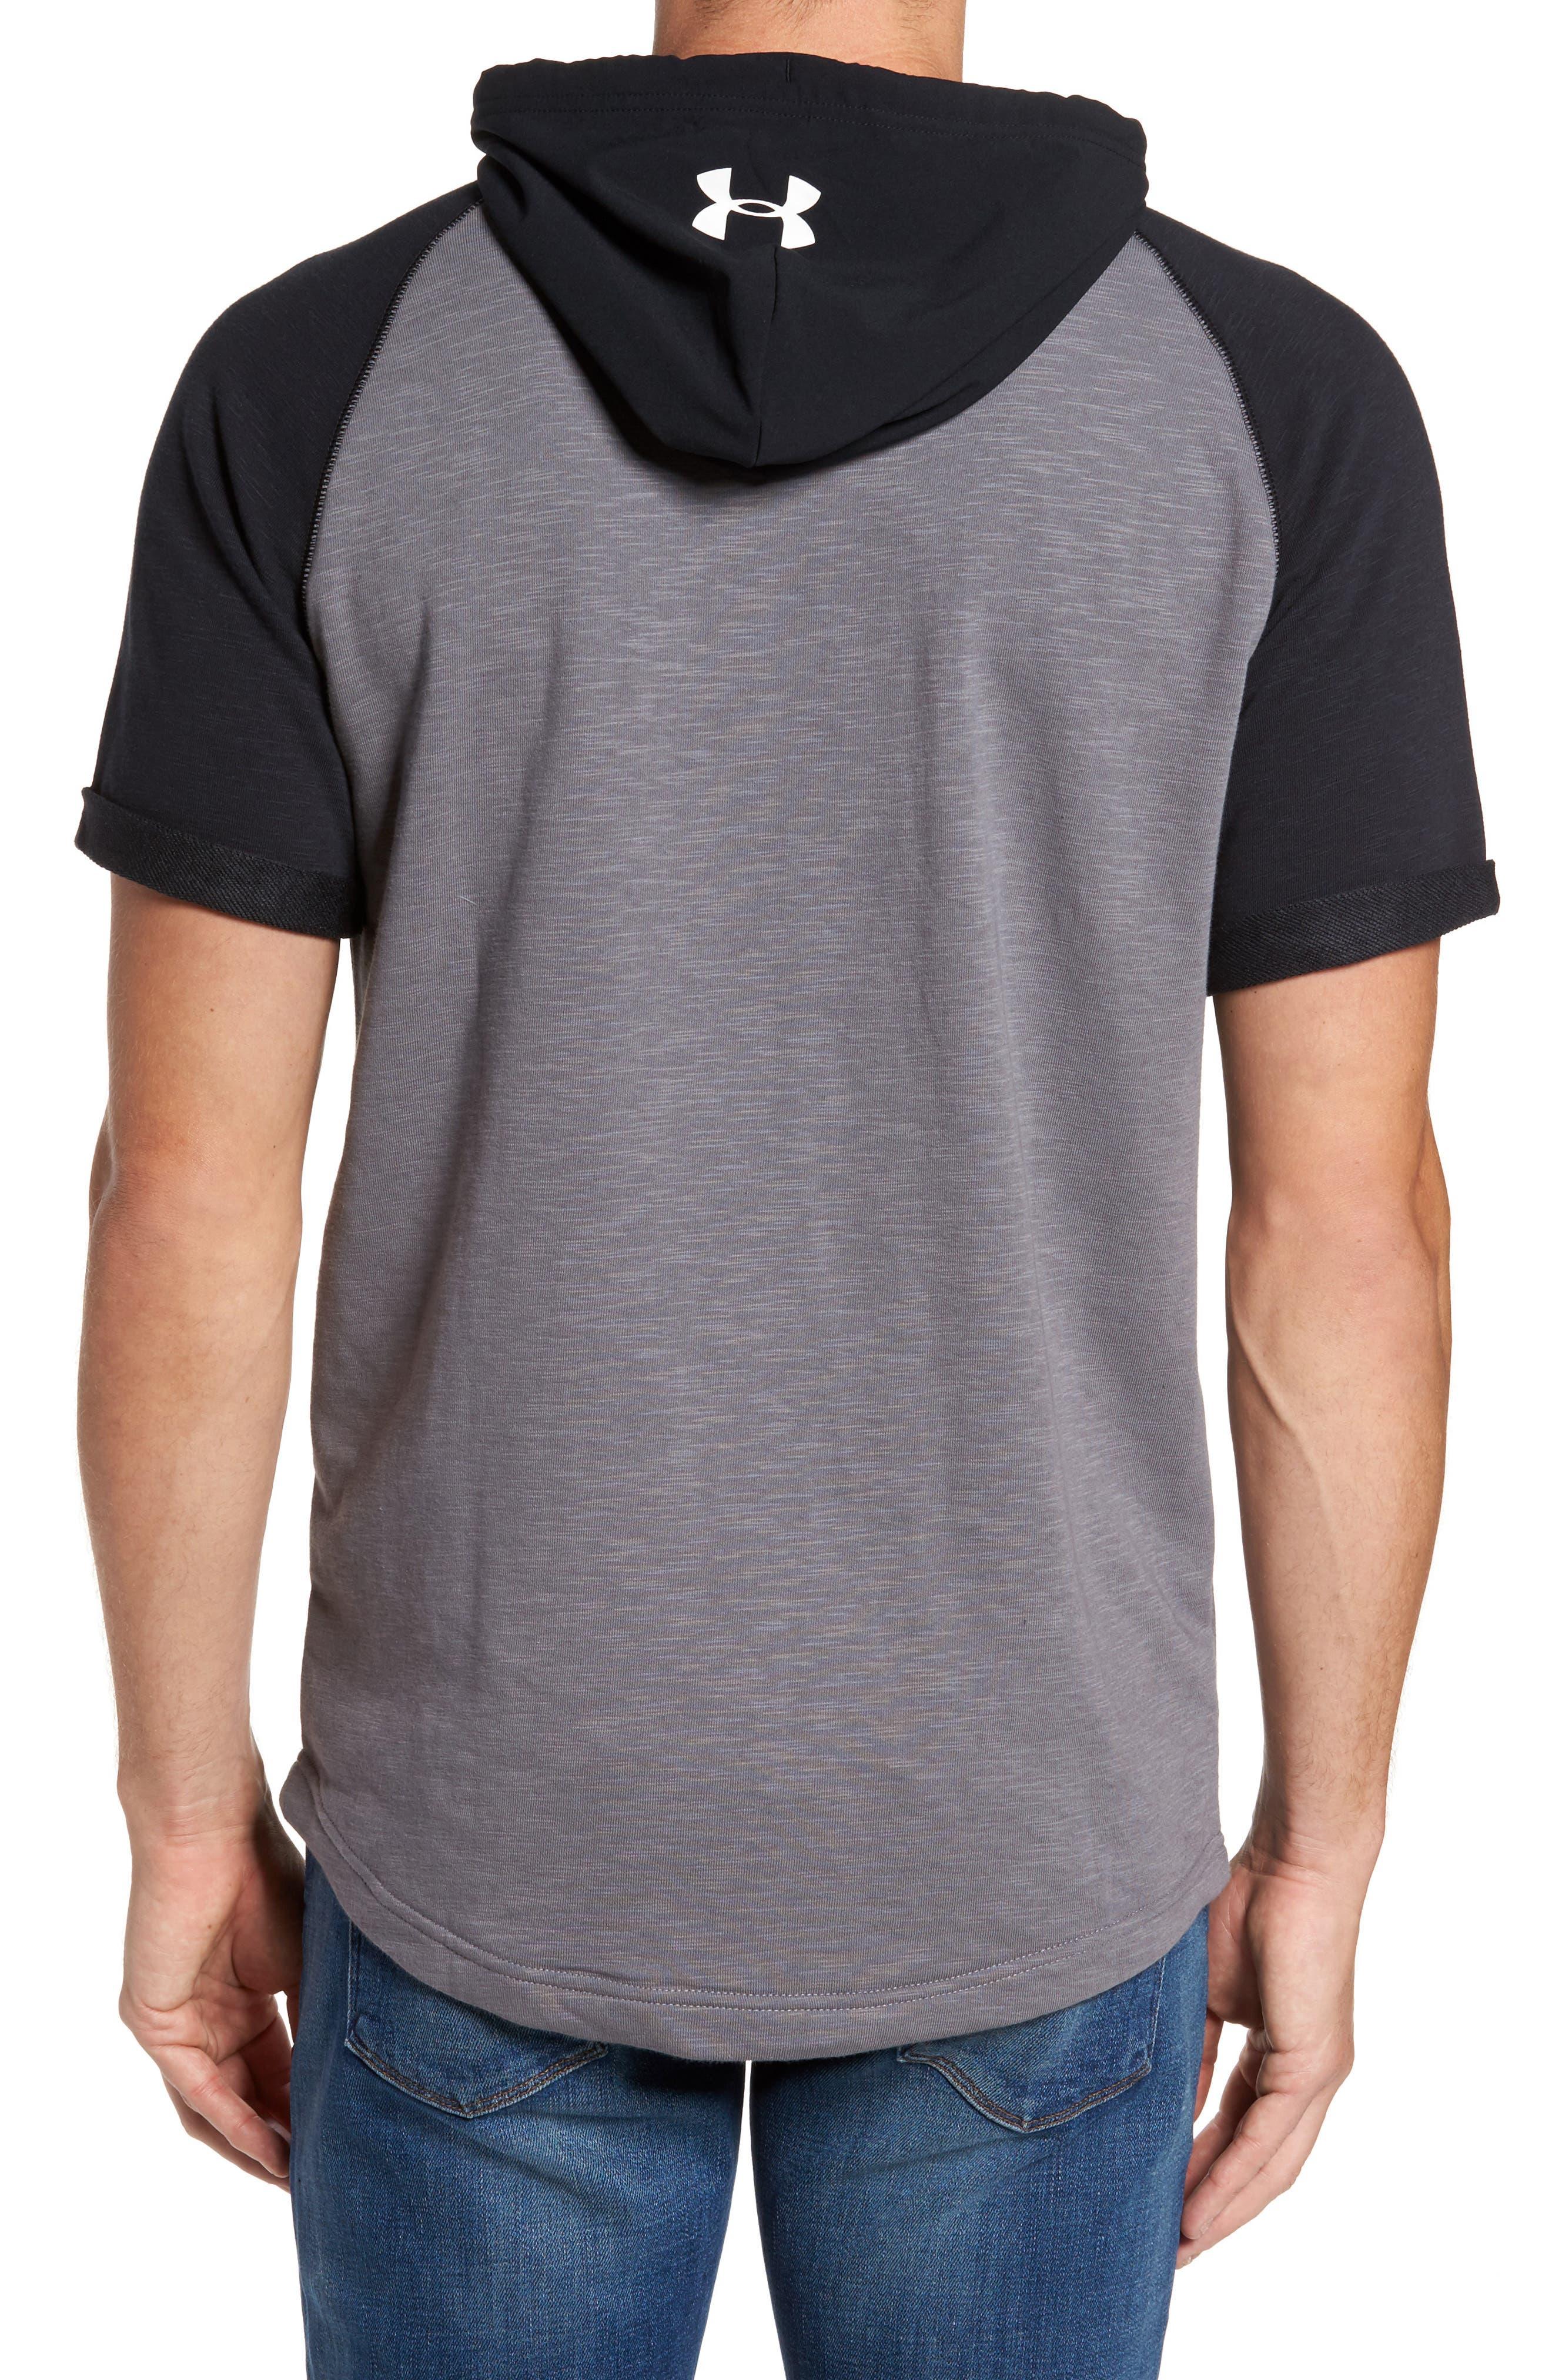 Alternate Image 2  - Under Armour Sportstyle Short Sleeve Hoodie